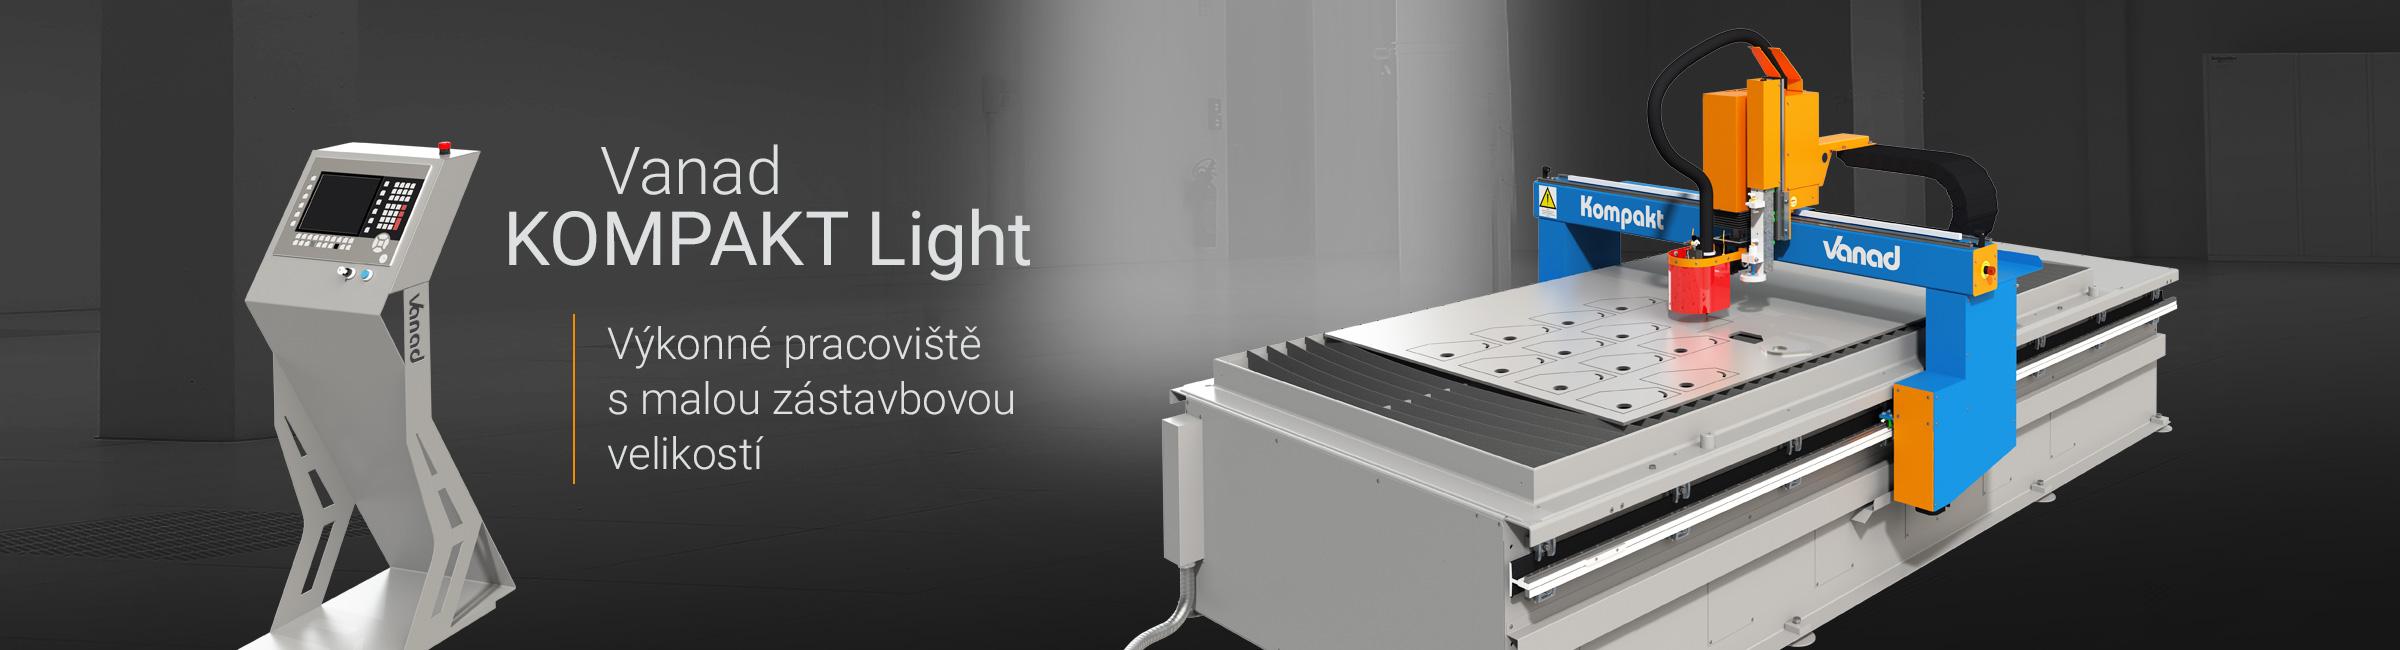 Stroj Kompakt Light - cz